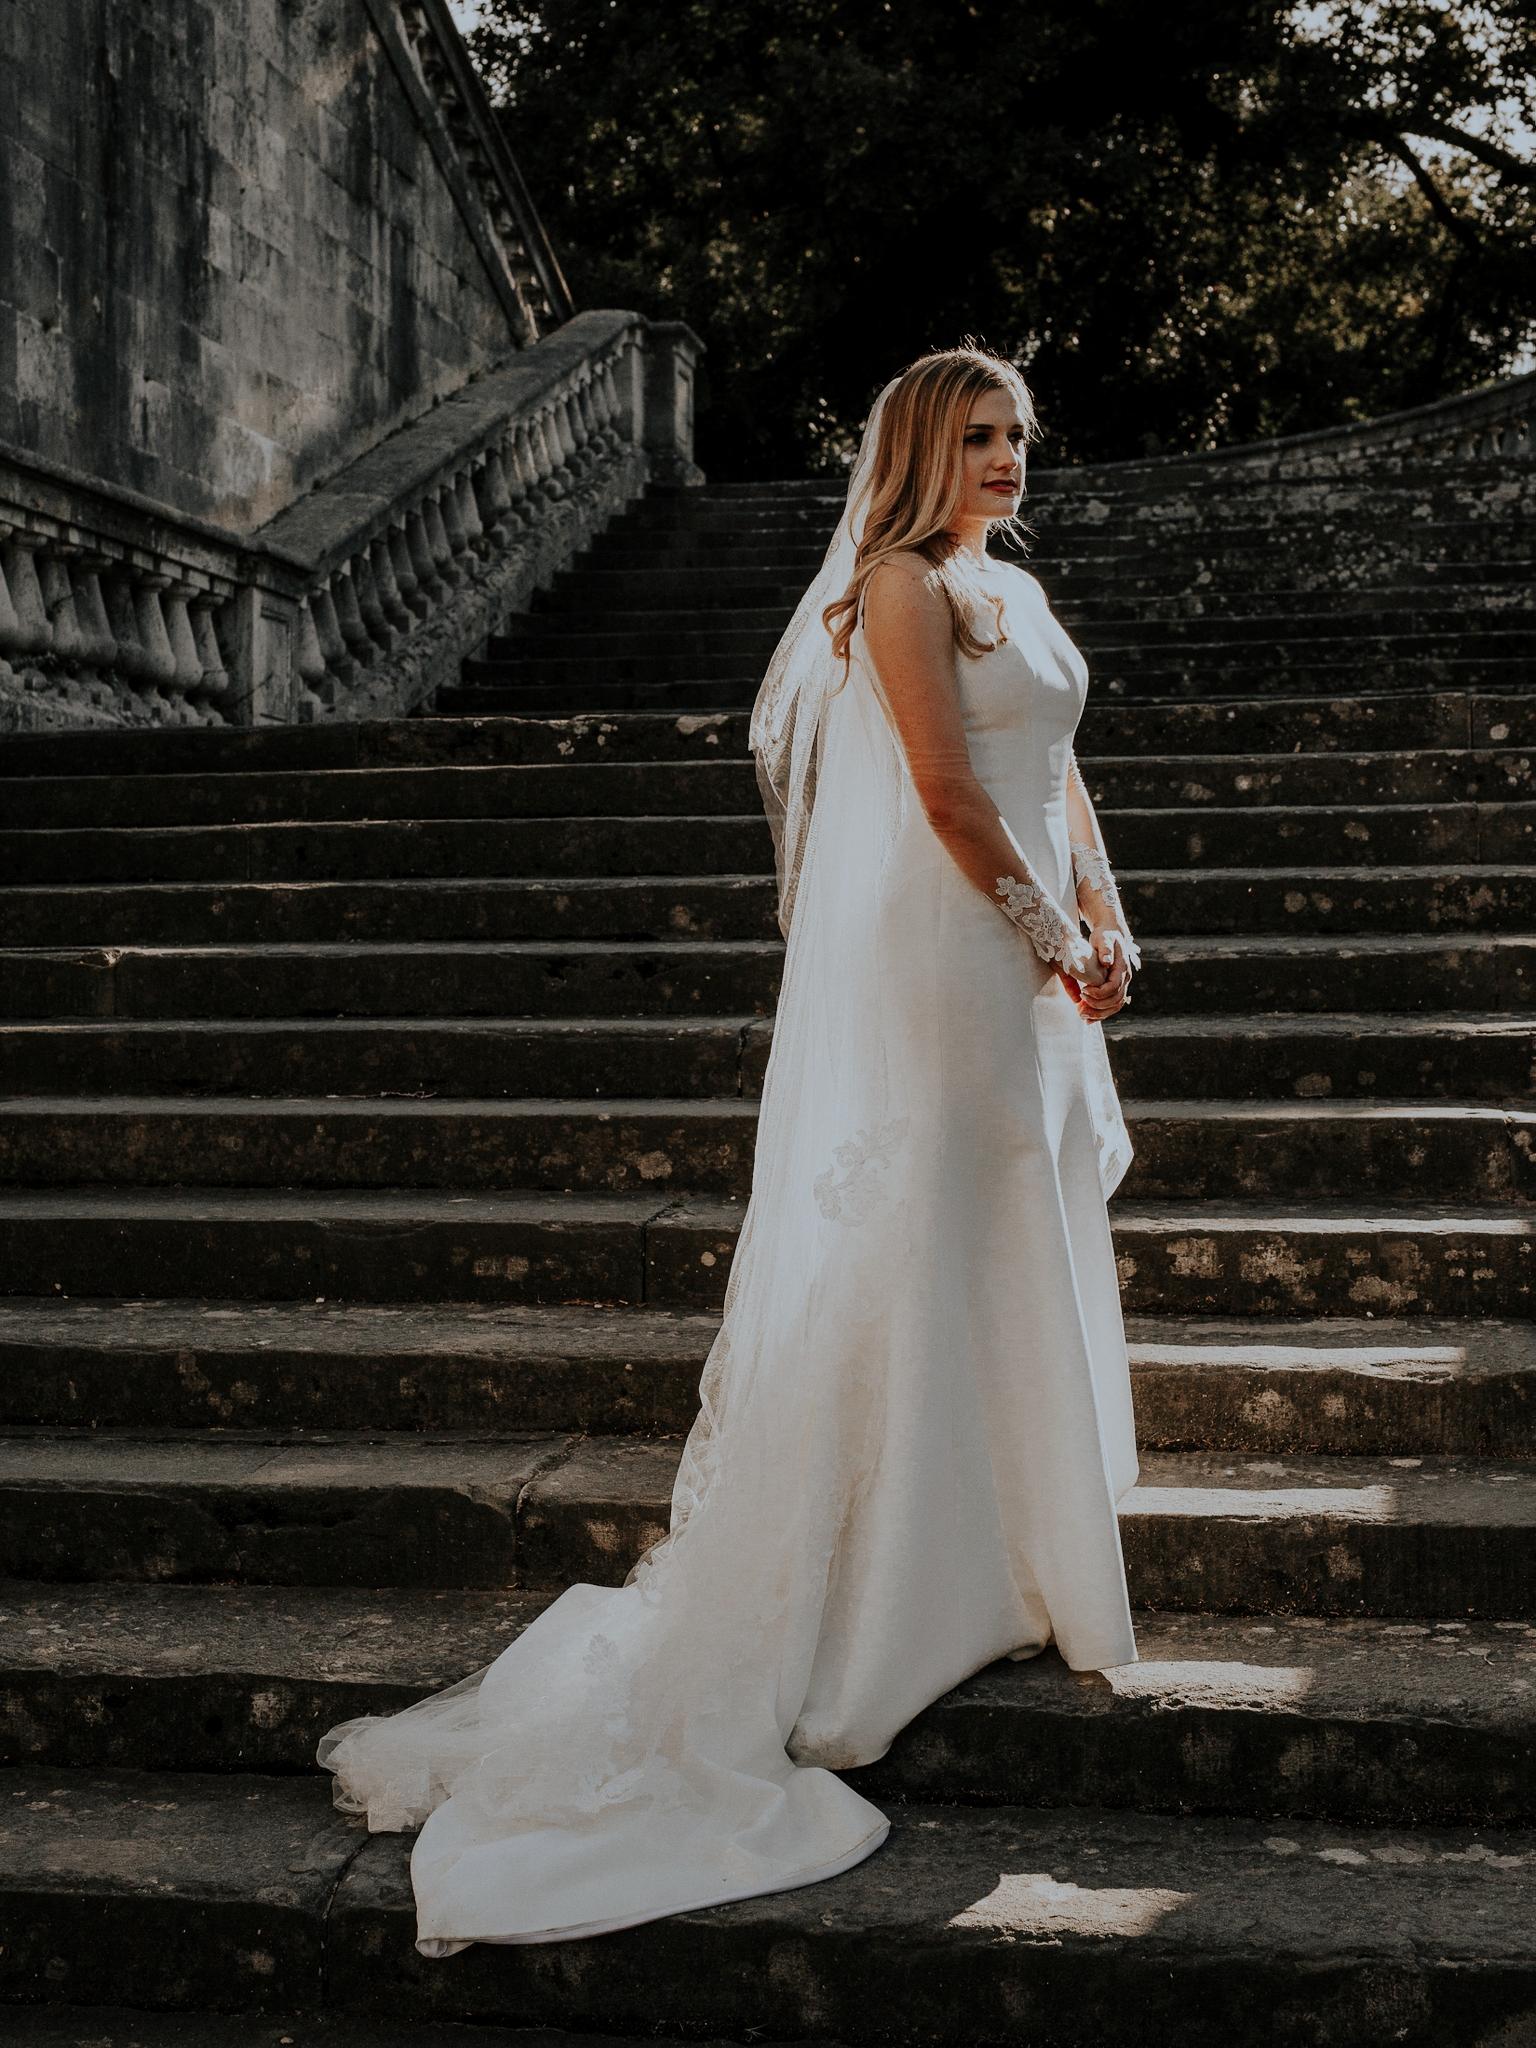 destination-austin-wedding-photographer-italy-florence494.JPG